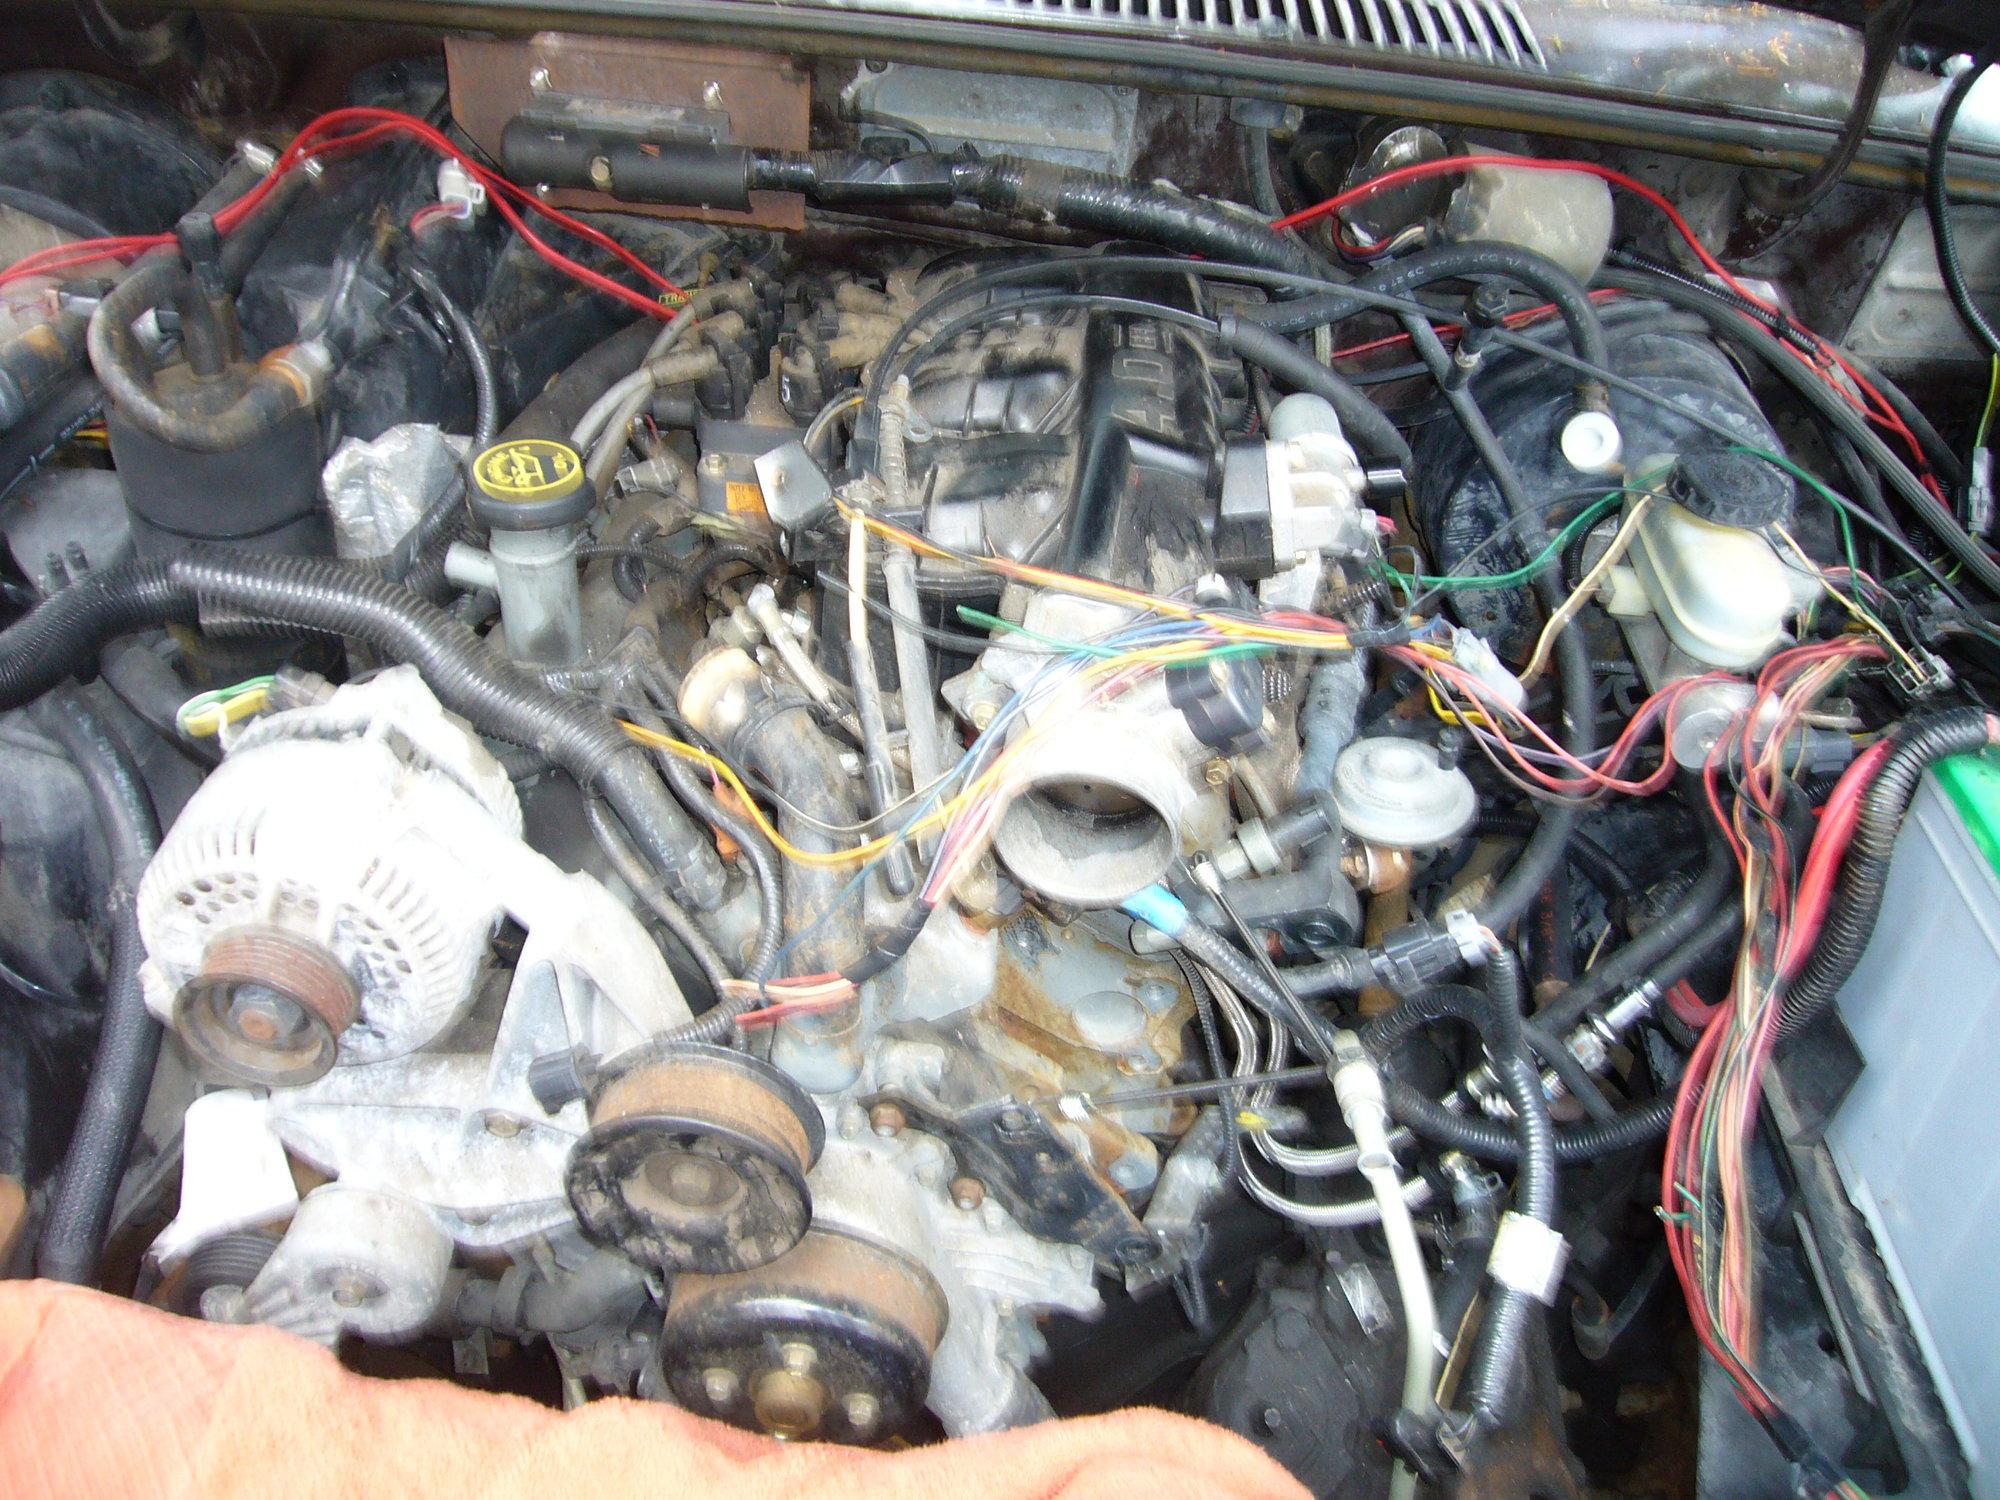 engine swap wiring harness 3 0 ranger - wiring diagram bear-shine-a -  bear-shine-a.zaafran.it  zaafran.it